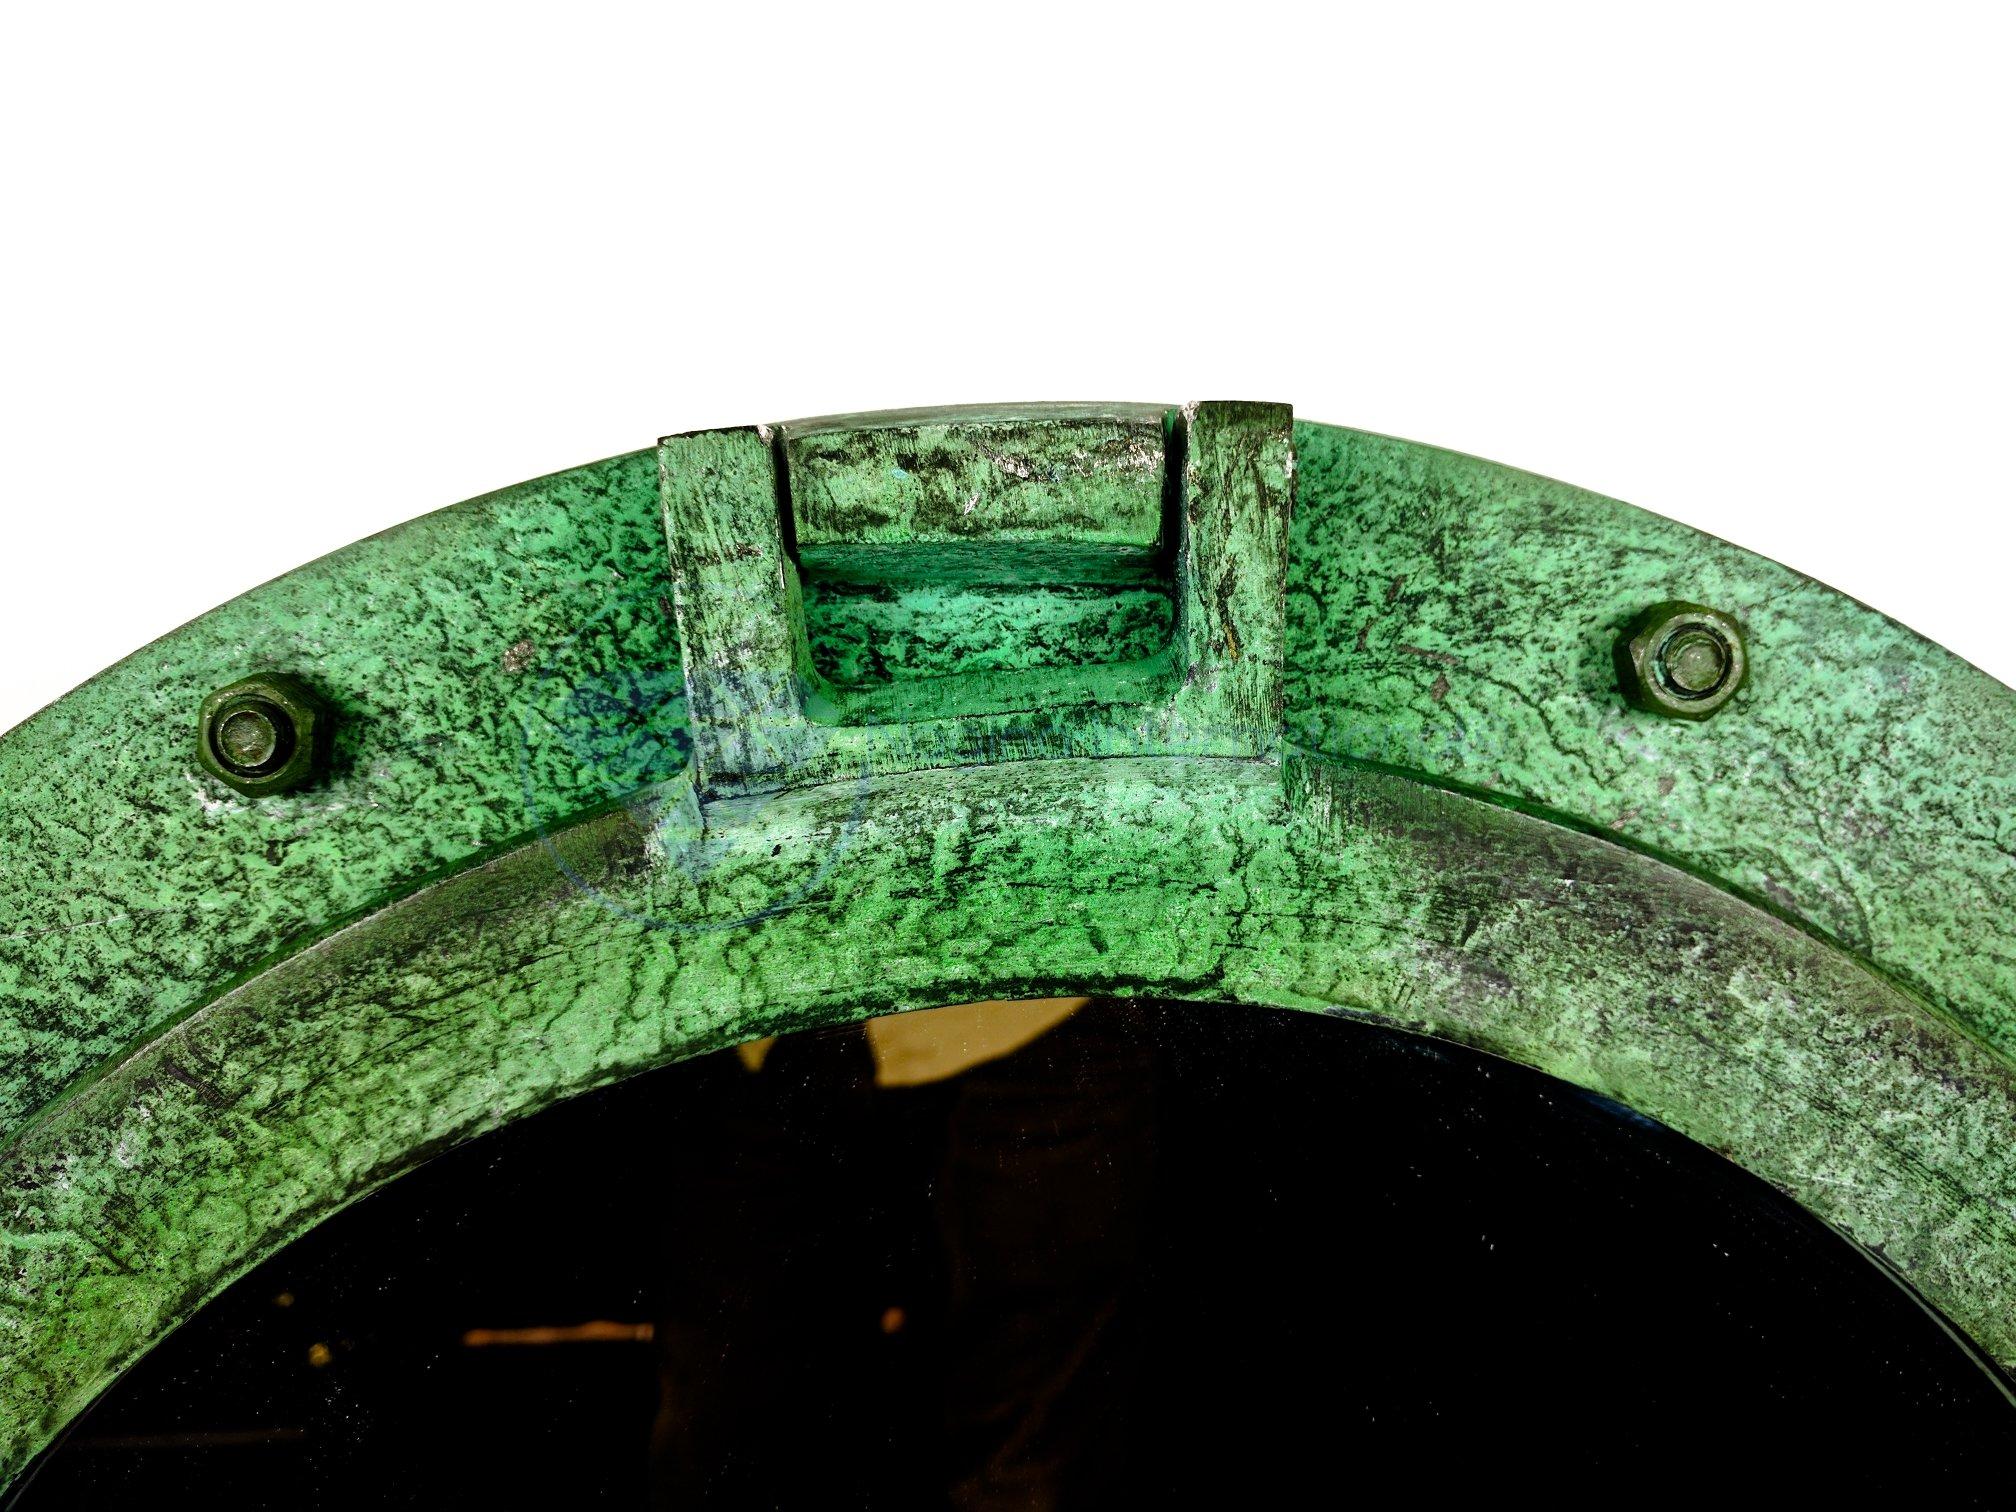 20'' Shipwrecked Premium Aluminum Antique Algae Green Porthole Mirror | Retirement Gift | Nagina International by Nagina International (Image #8)